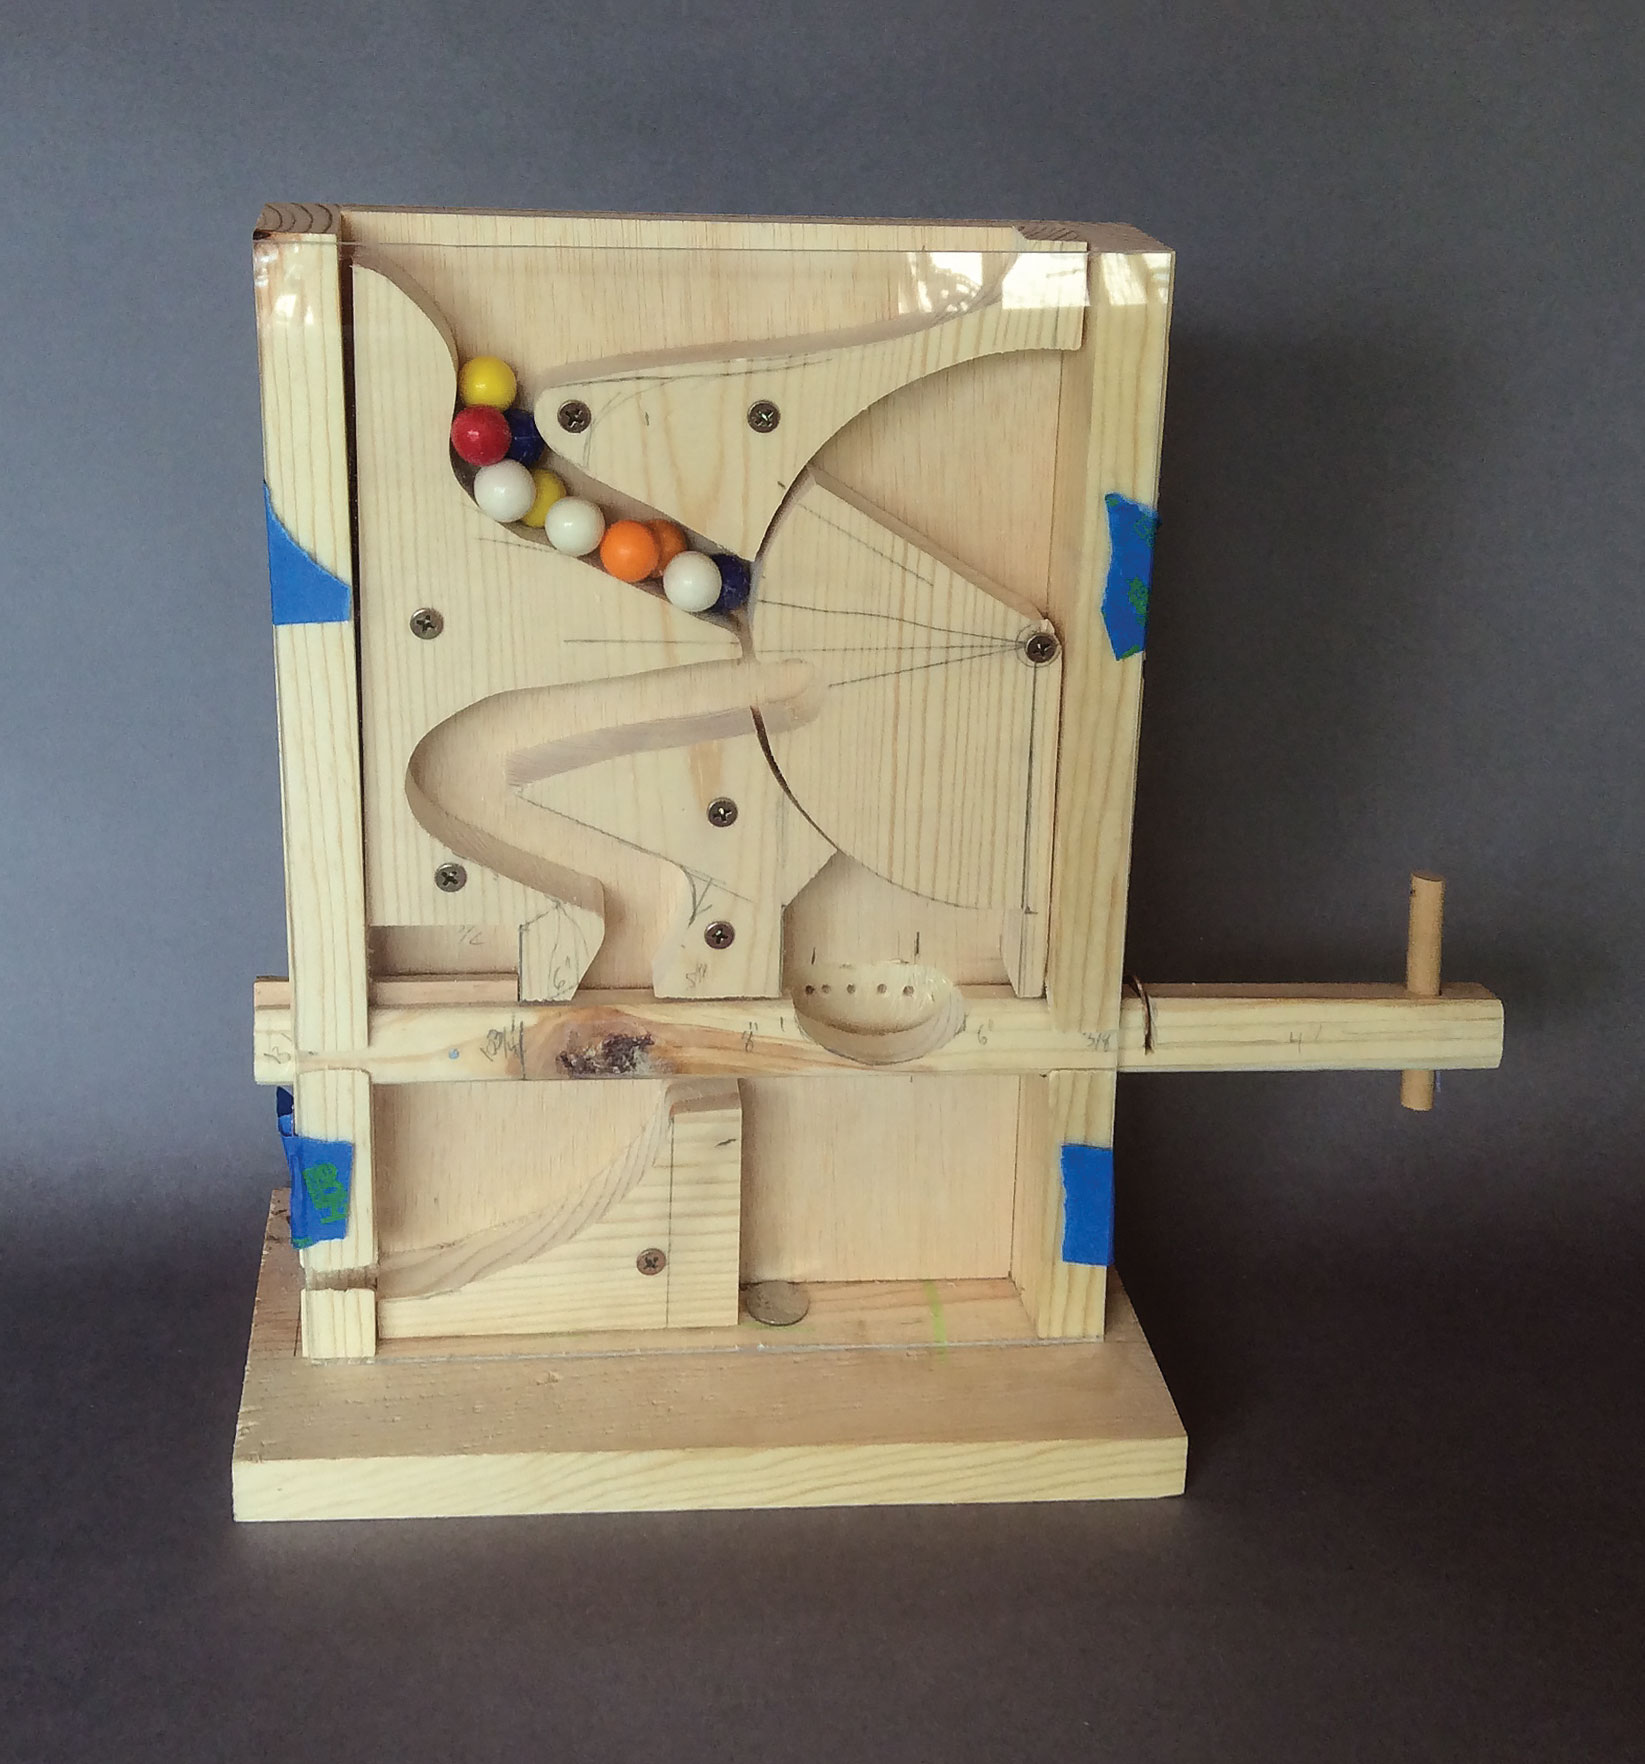 multigenerational woodworking - scroll saw woodworking & crafts